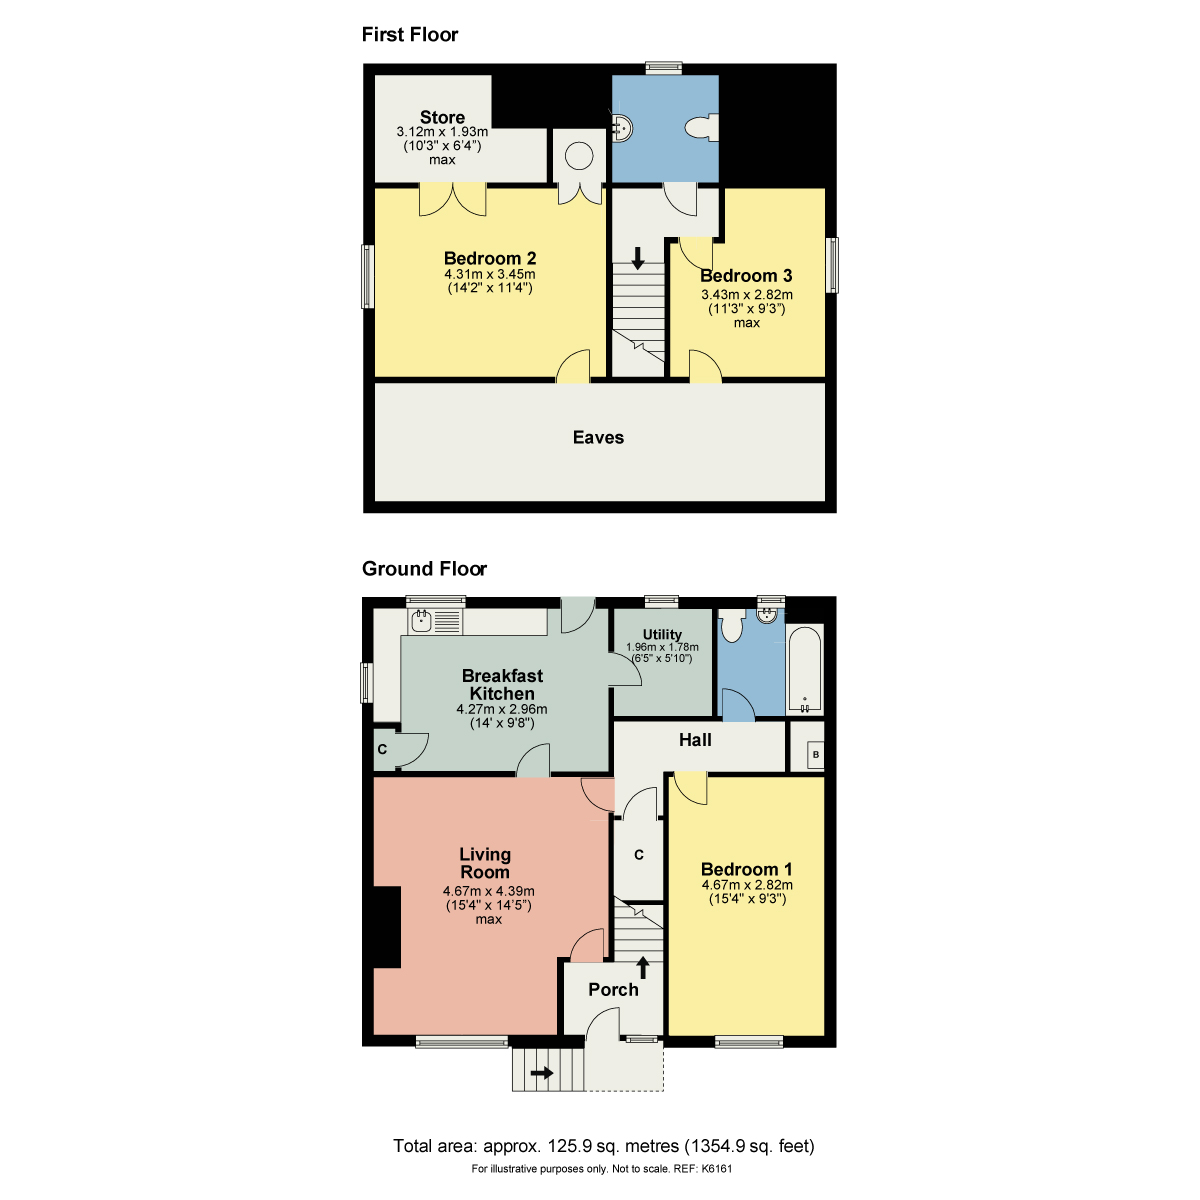 Floorplan Benson View, Sawmill Lane, Kendal, Cumbria, LA9 6JA